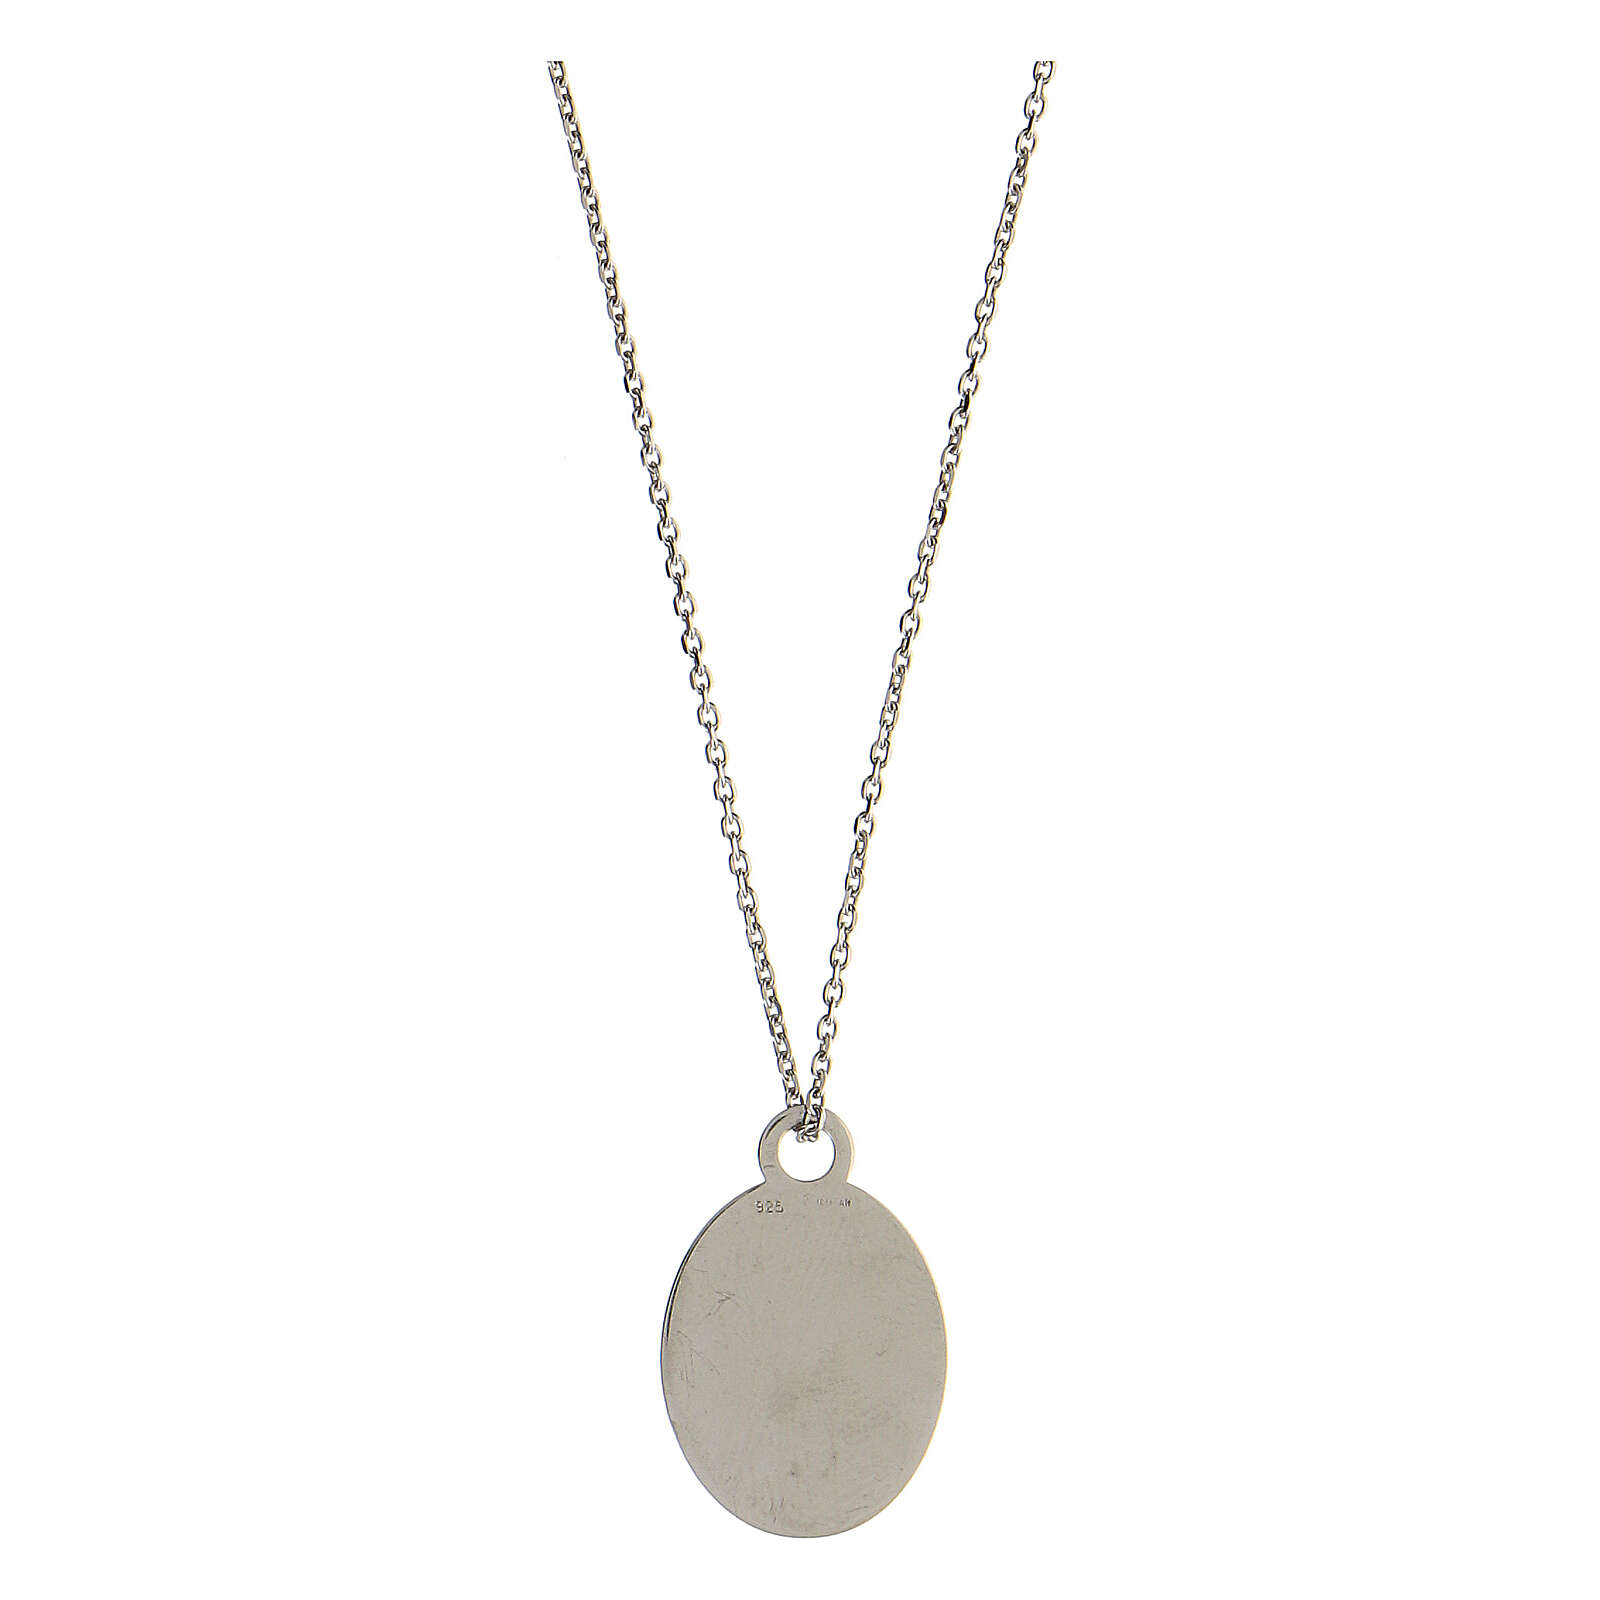 Medalha Solo L'Amore Resta prata 925 4